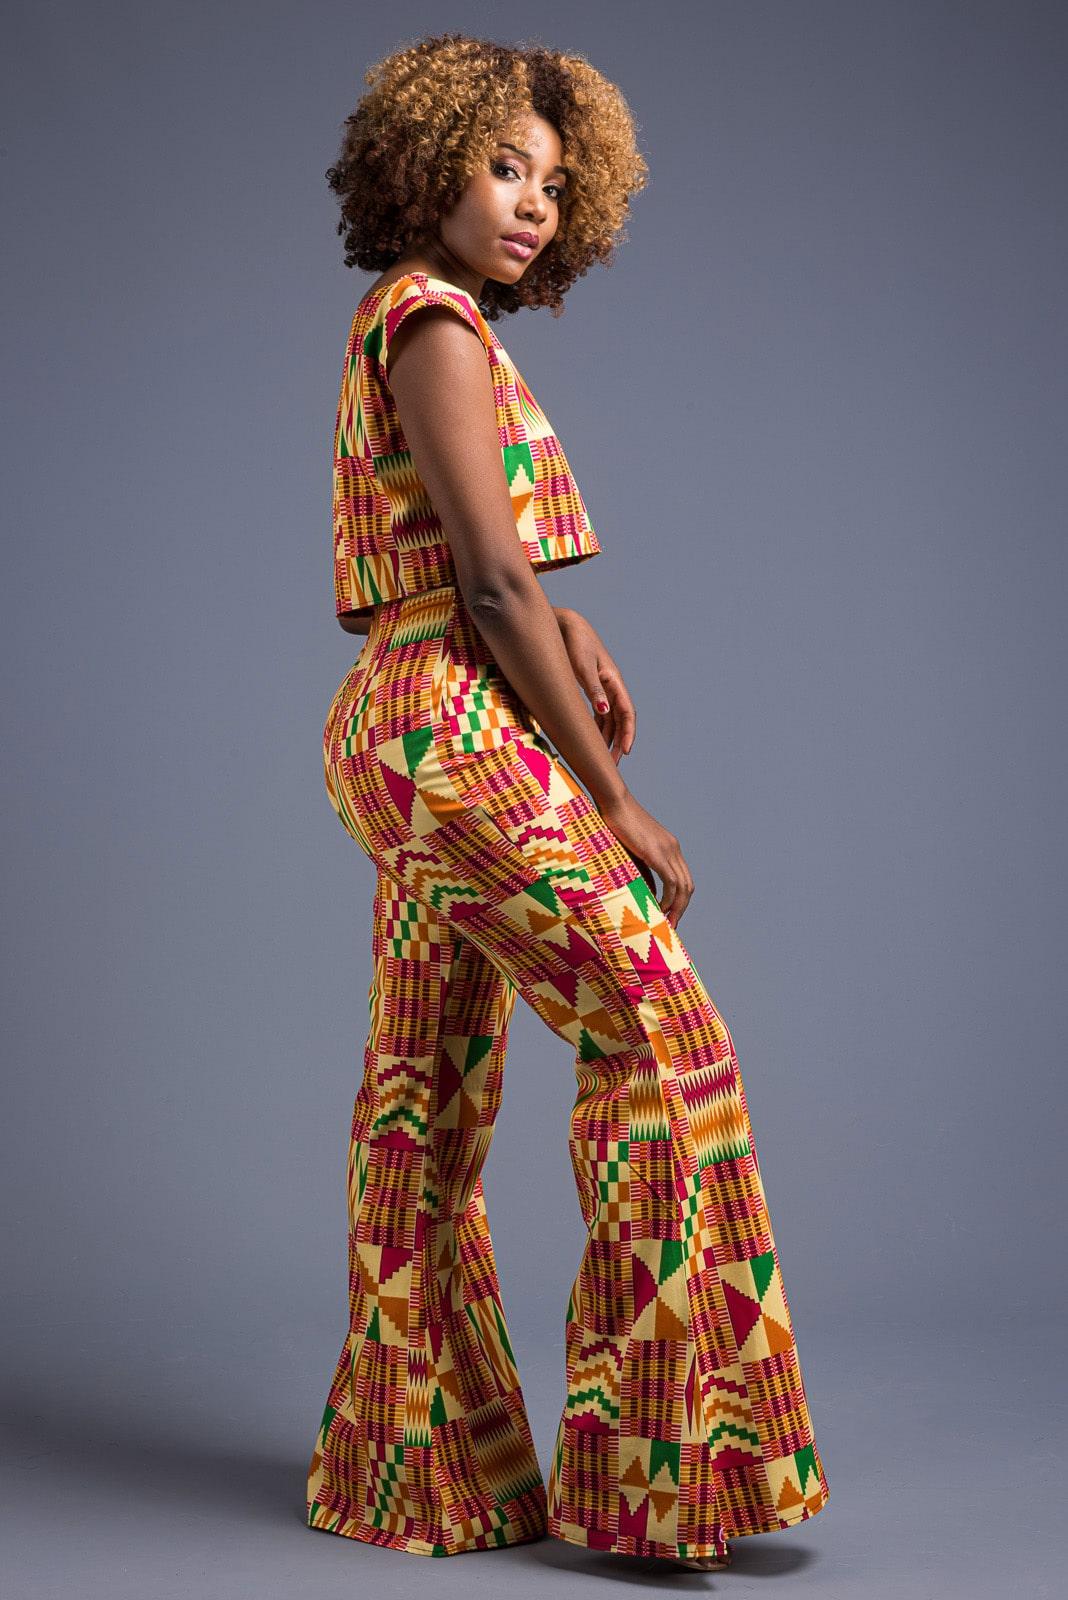 Karen modelling one of her own designs